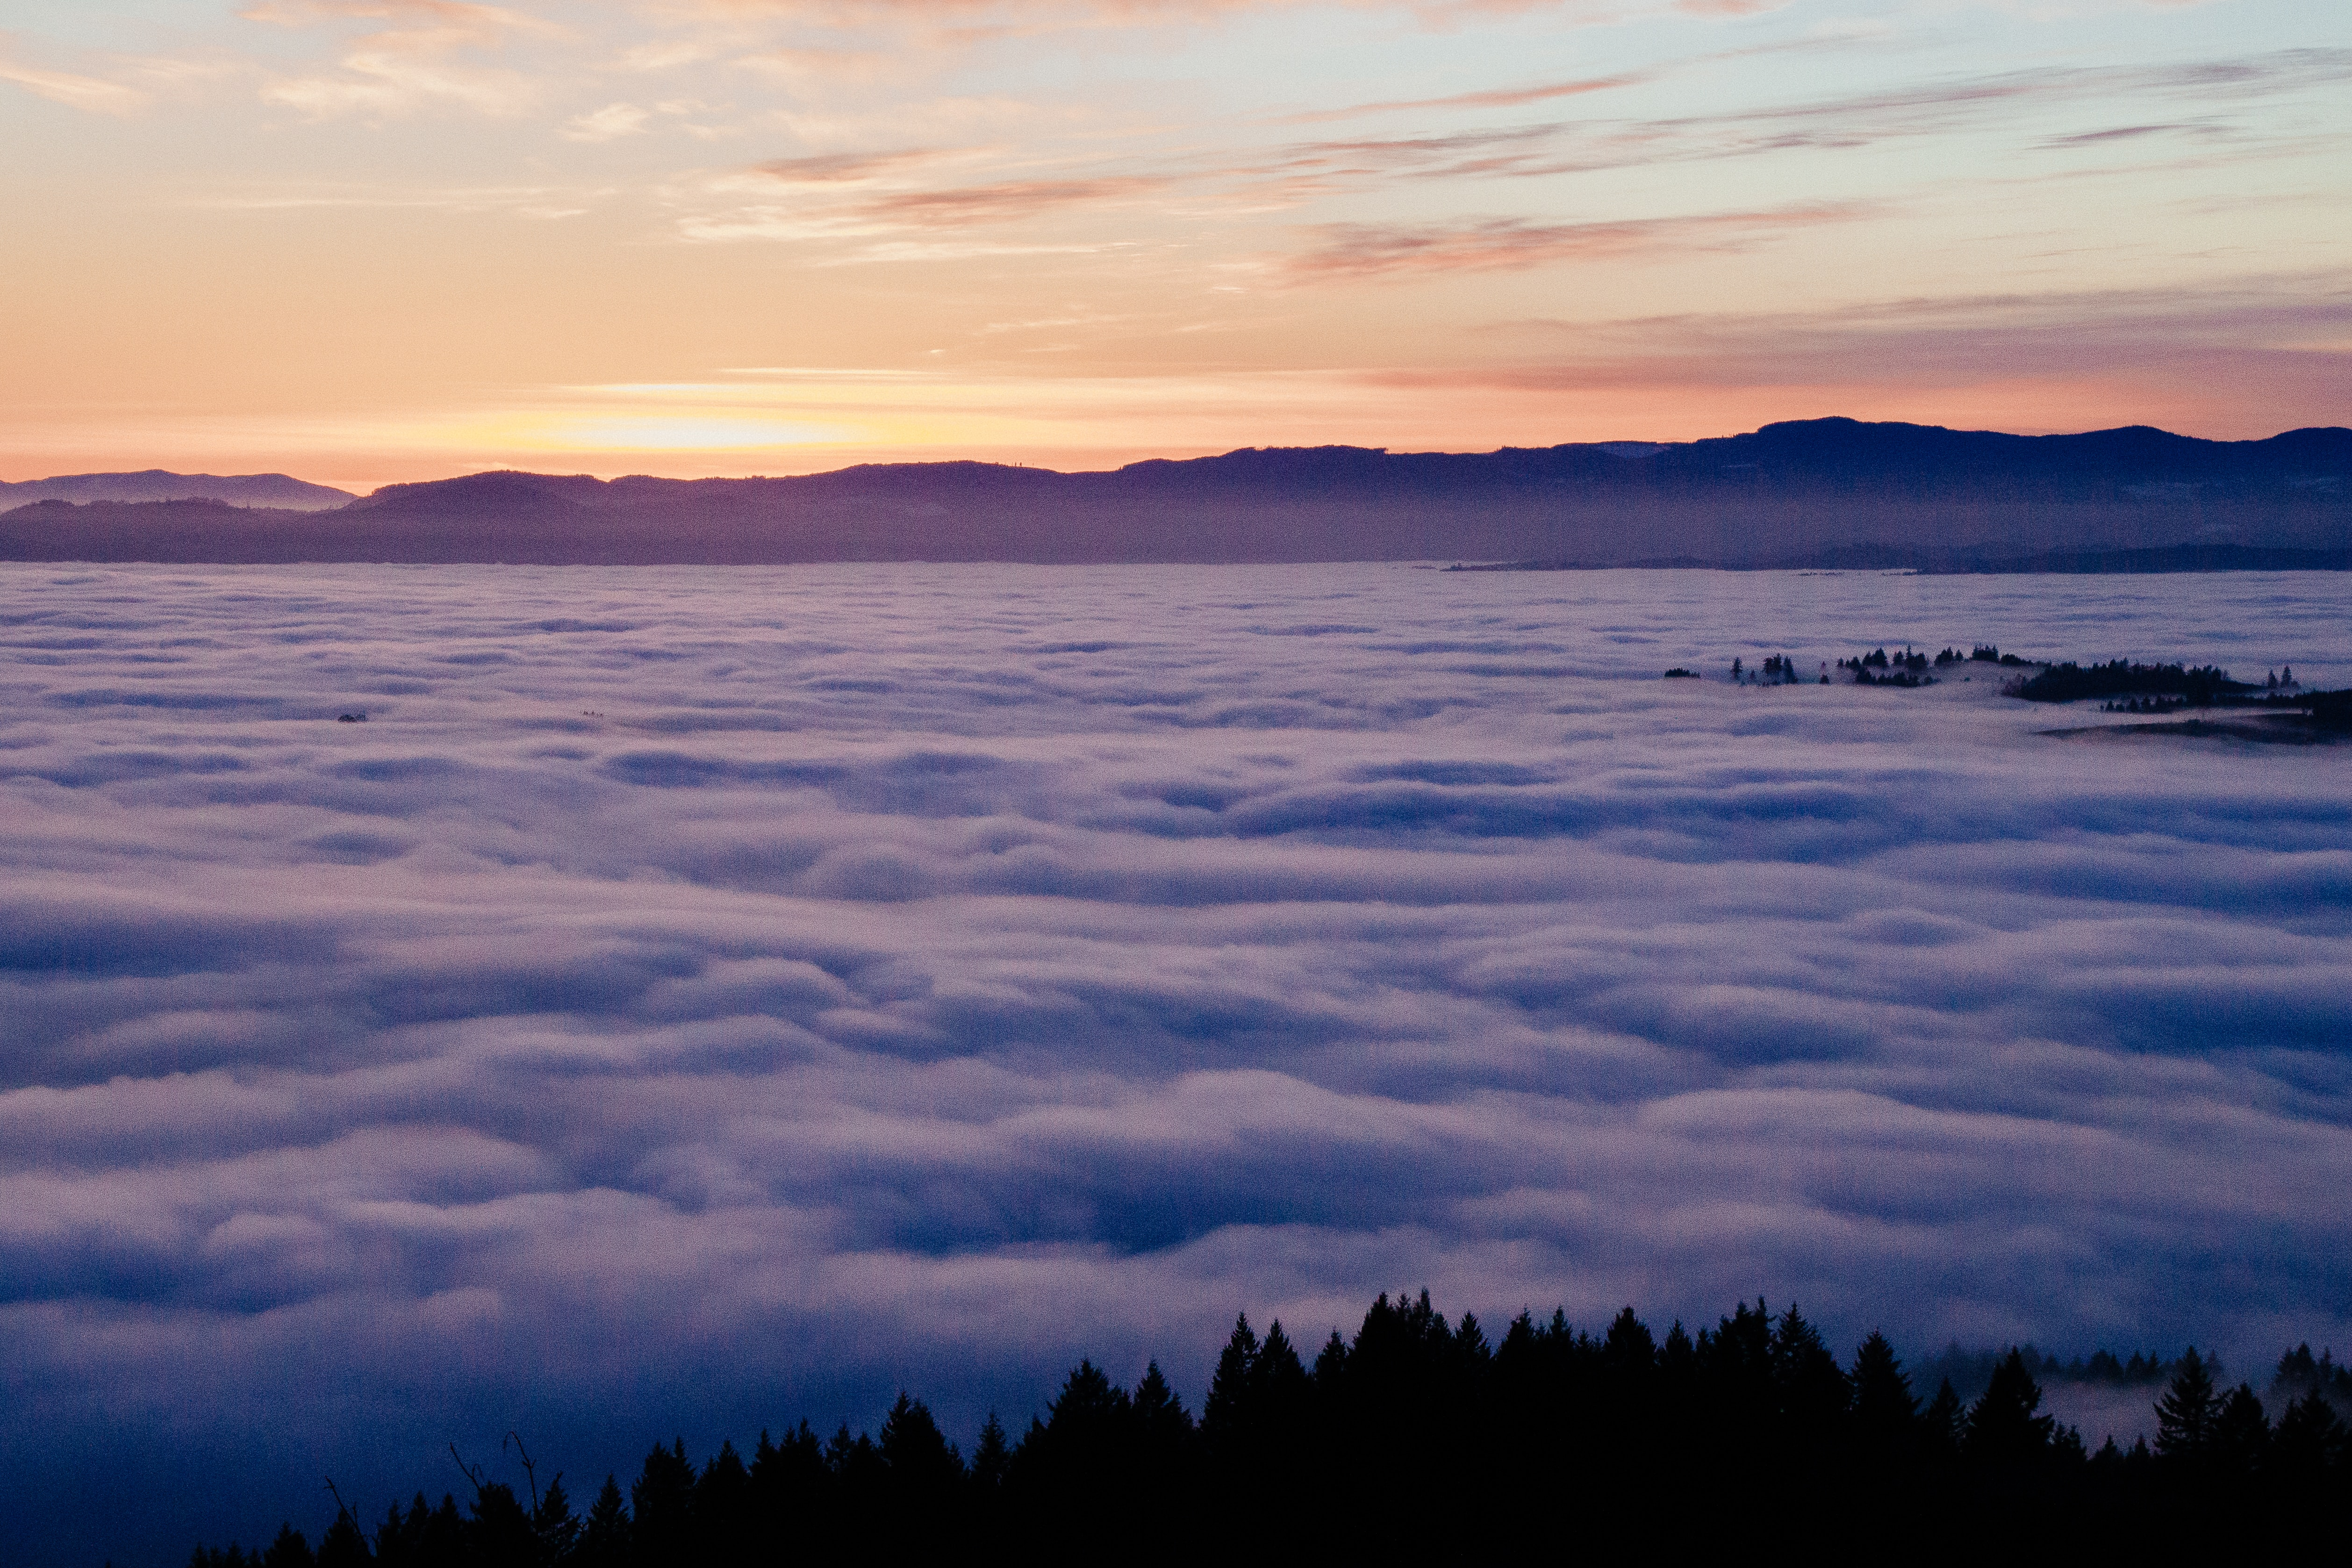 sea of clouds 1574937662 - Sea Of Clouds -